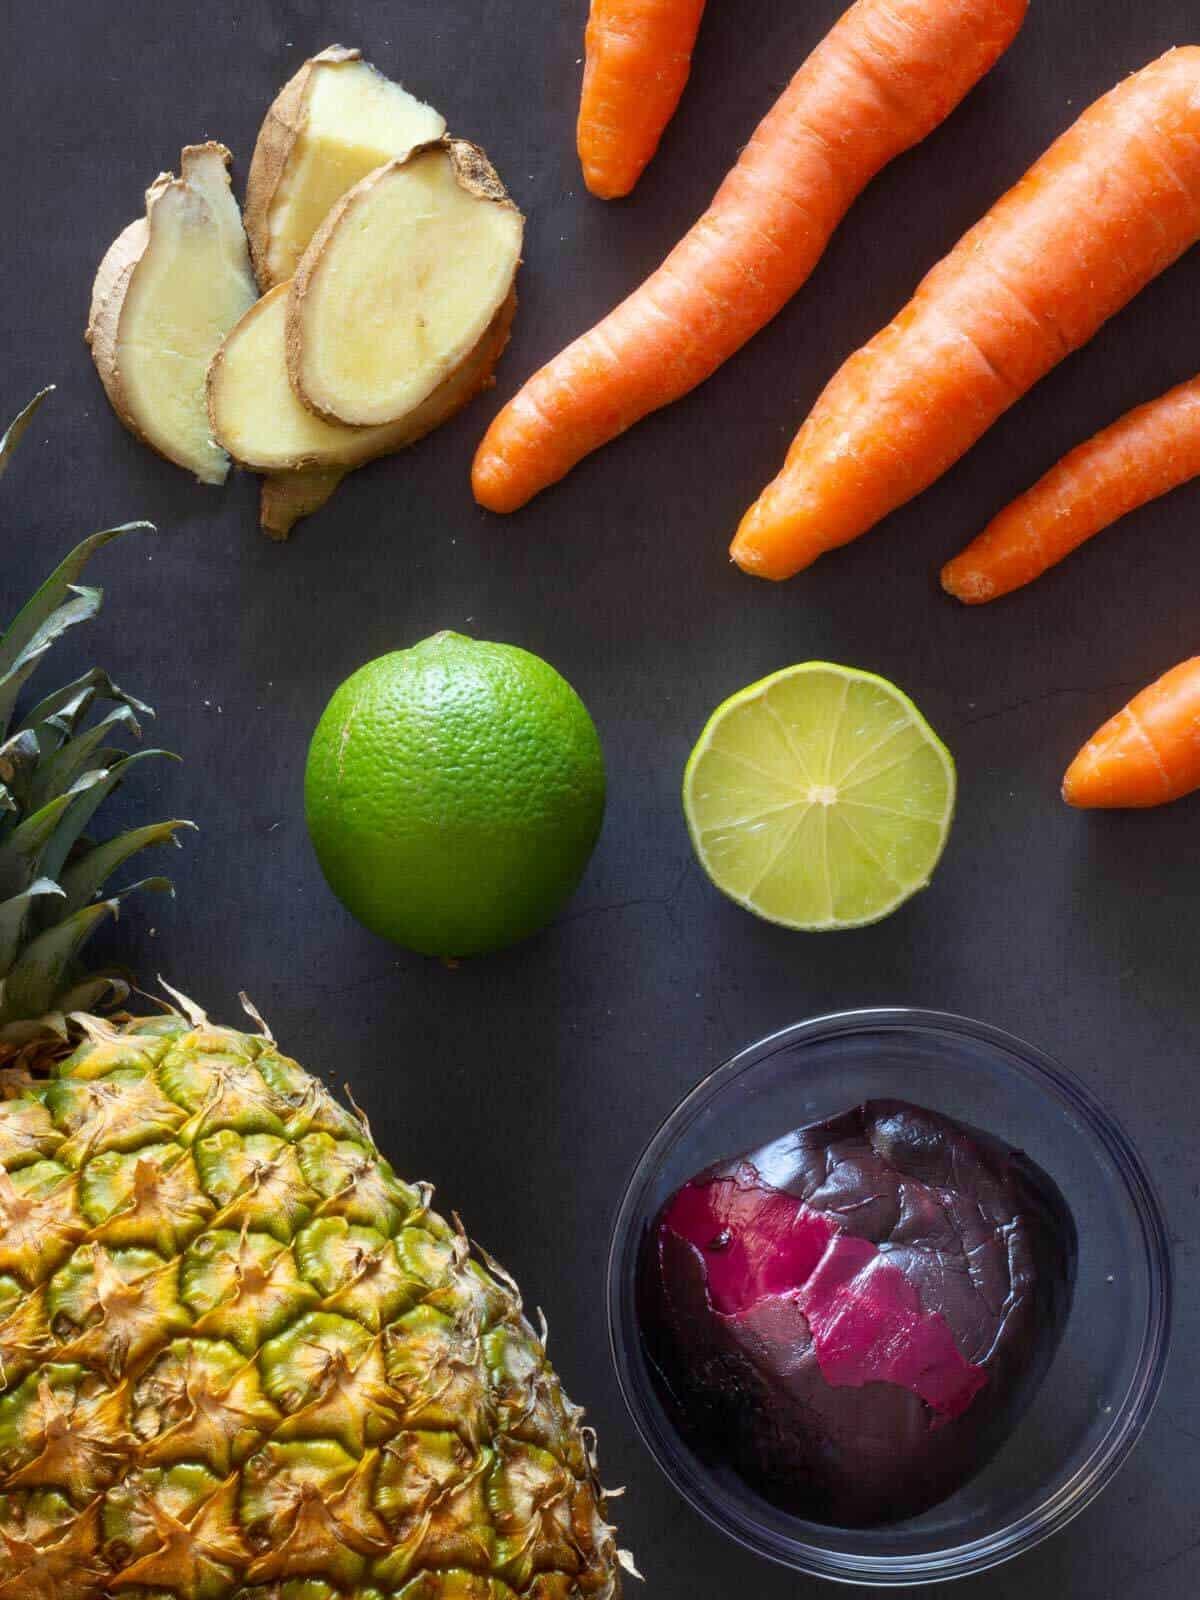 Beetroot Detox Juice ingredients